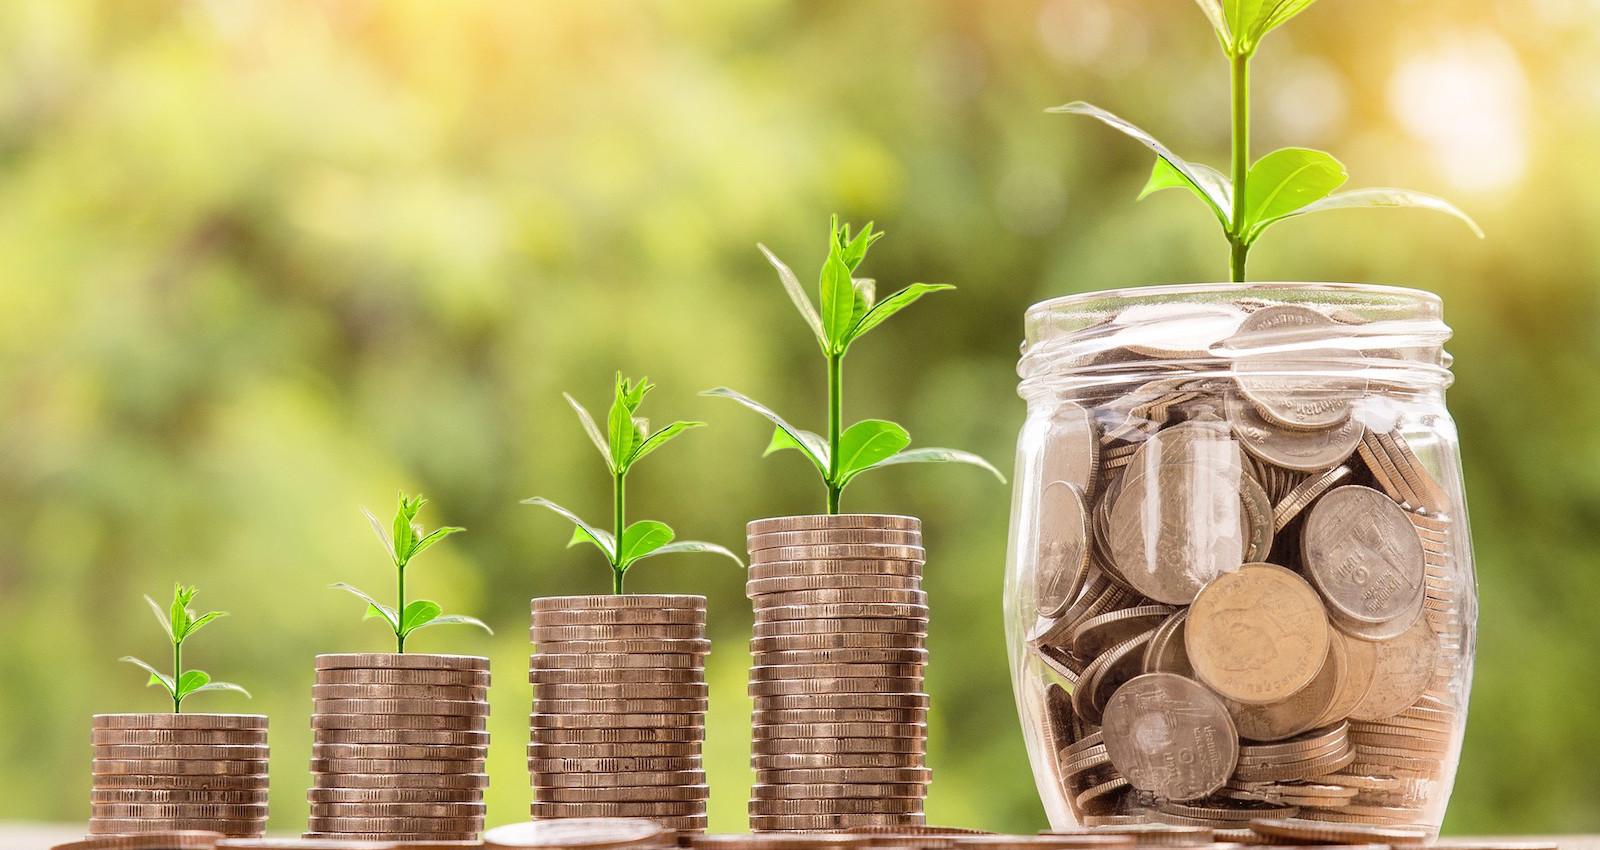 Geld sparen, Finanzen optimieren, mehr Geld